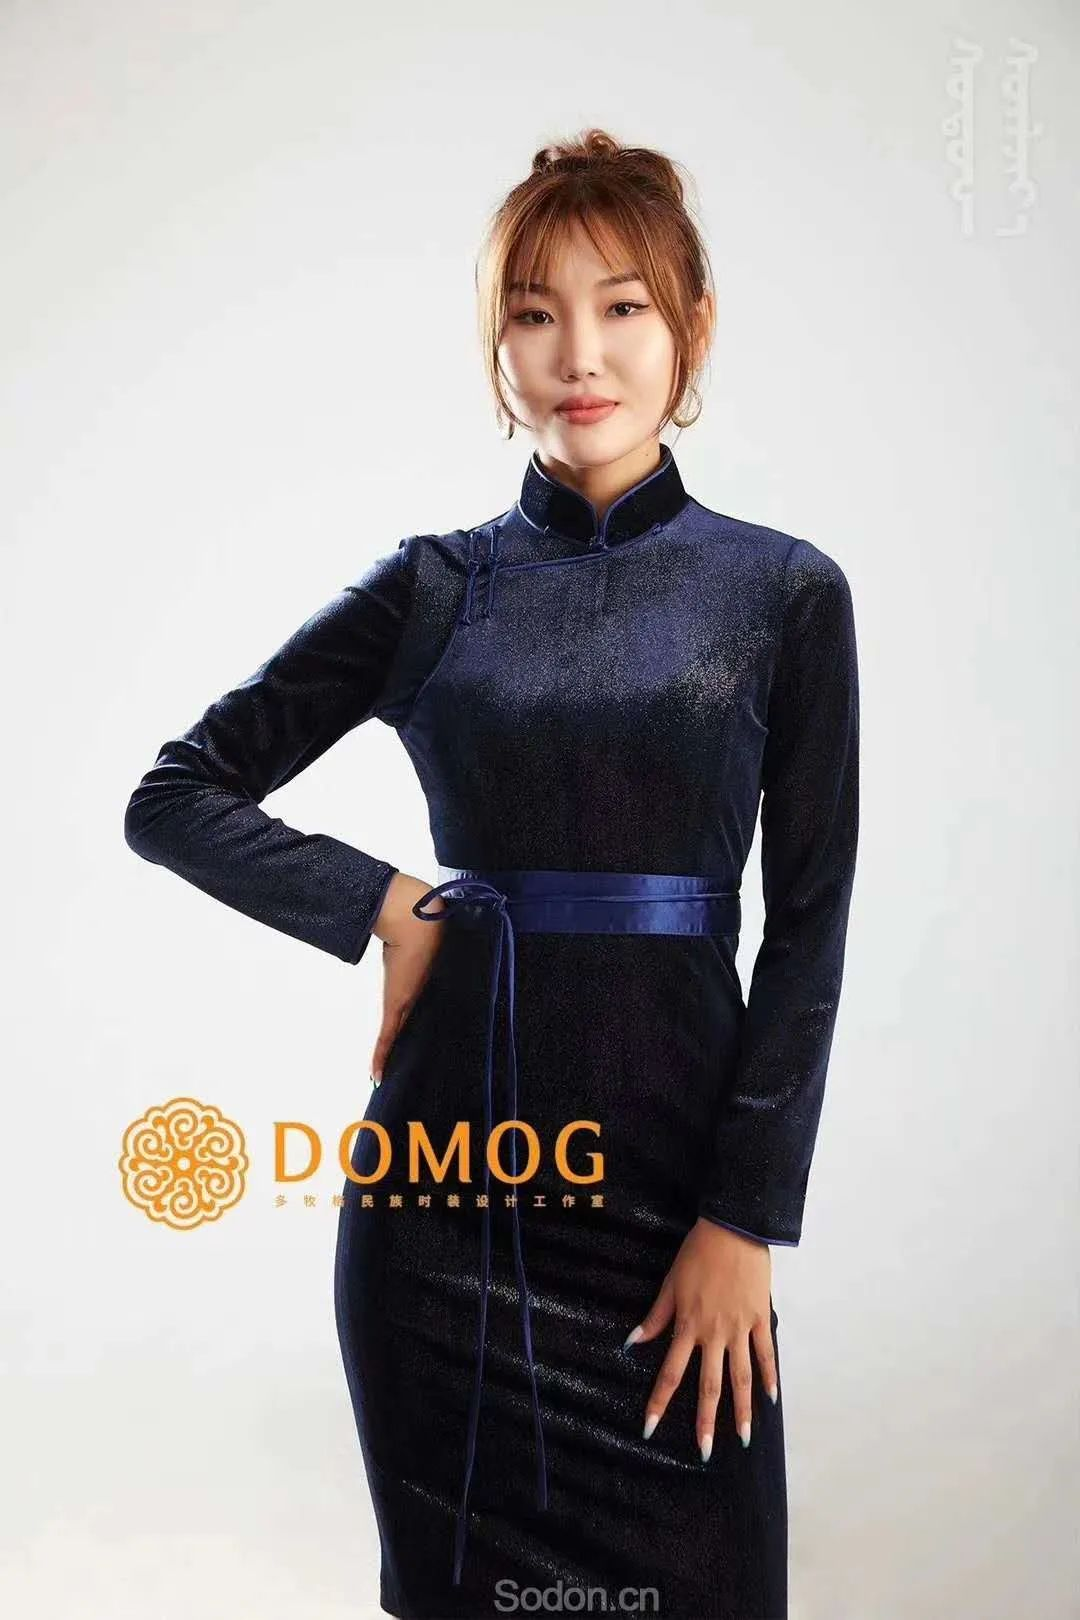 DOMOG 蒙古时装2020新款,民族与时尚的融合 第44张 DOMOG 蒙古时装2020新款,民族与时尚的融合 蒙古服饰